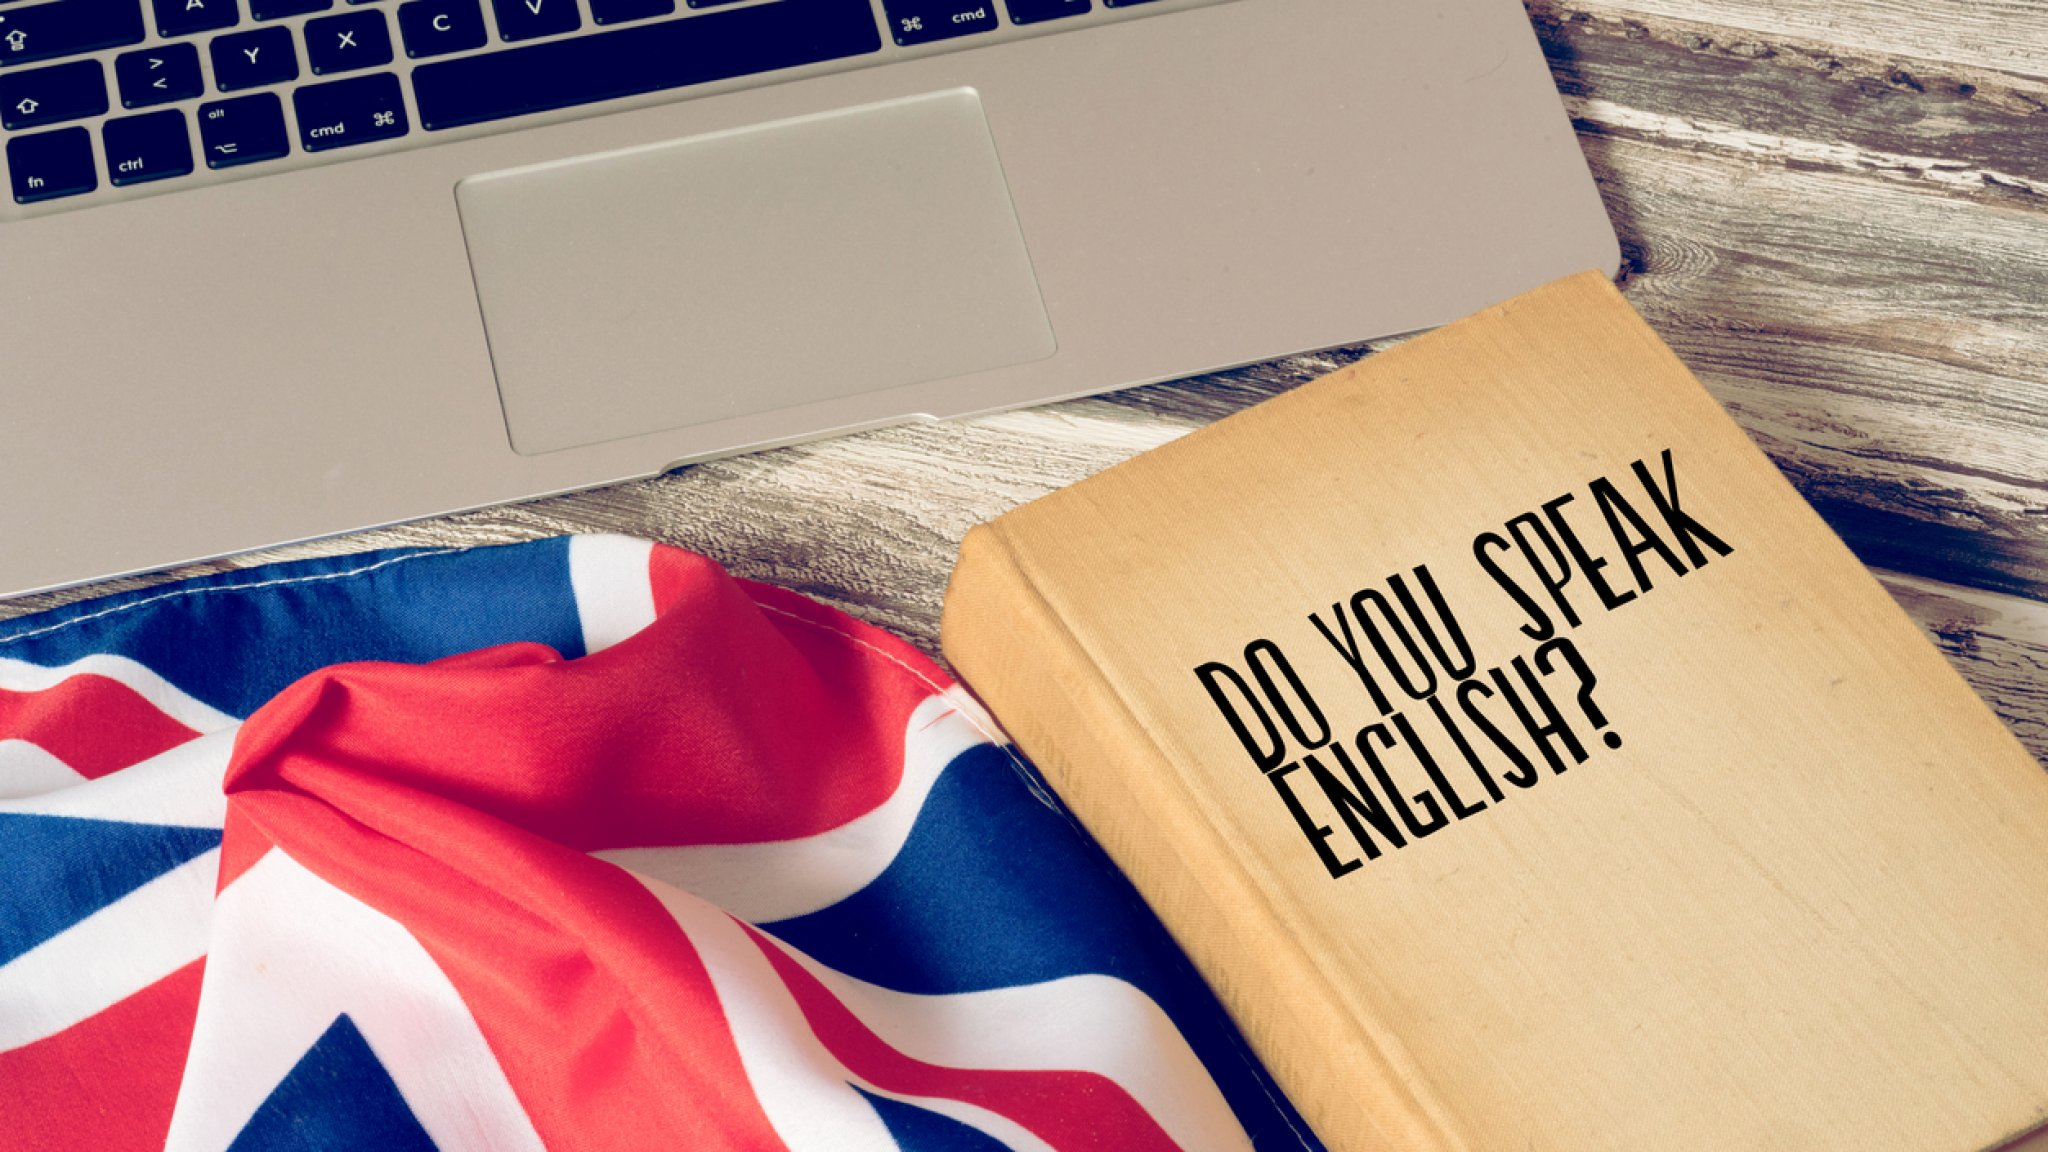 Quiz: spreek jij ook zo goed Engels? | RTL Nieuws